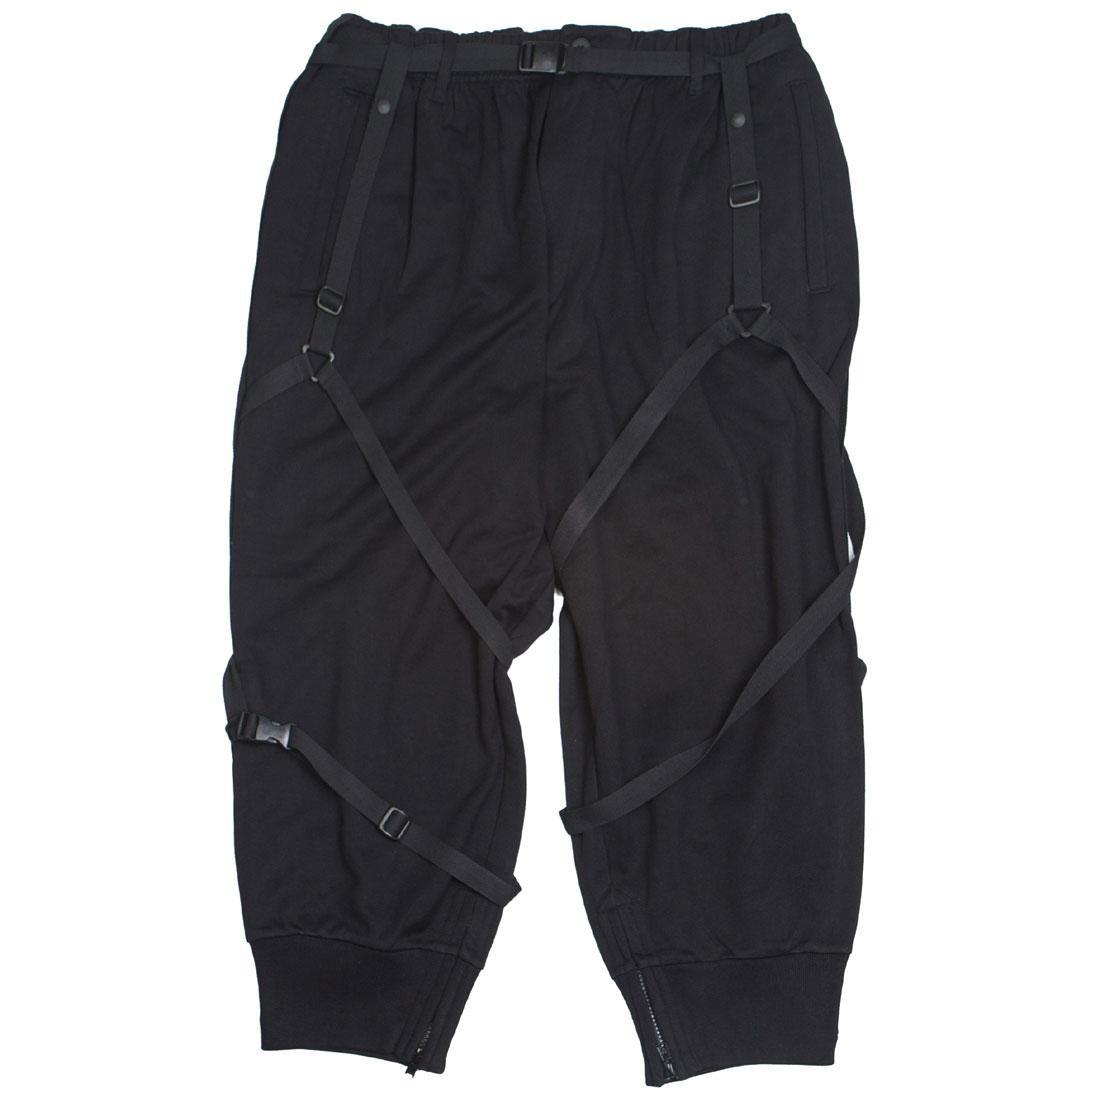 Adidas Y-3 Men Parachute Cropped Pants